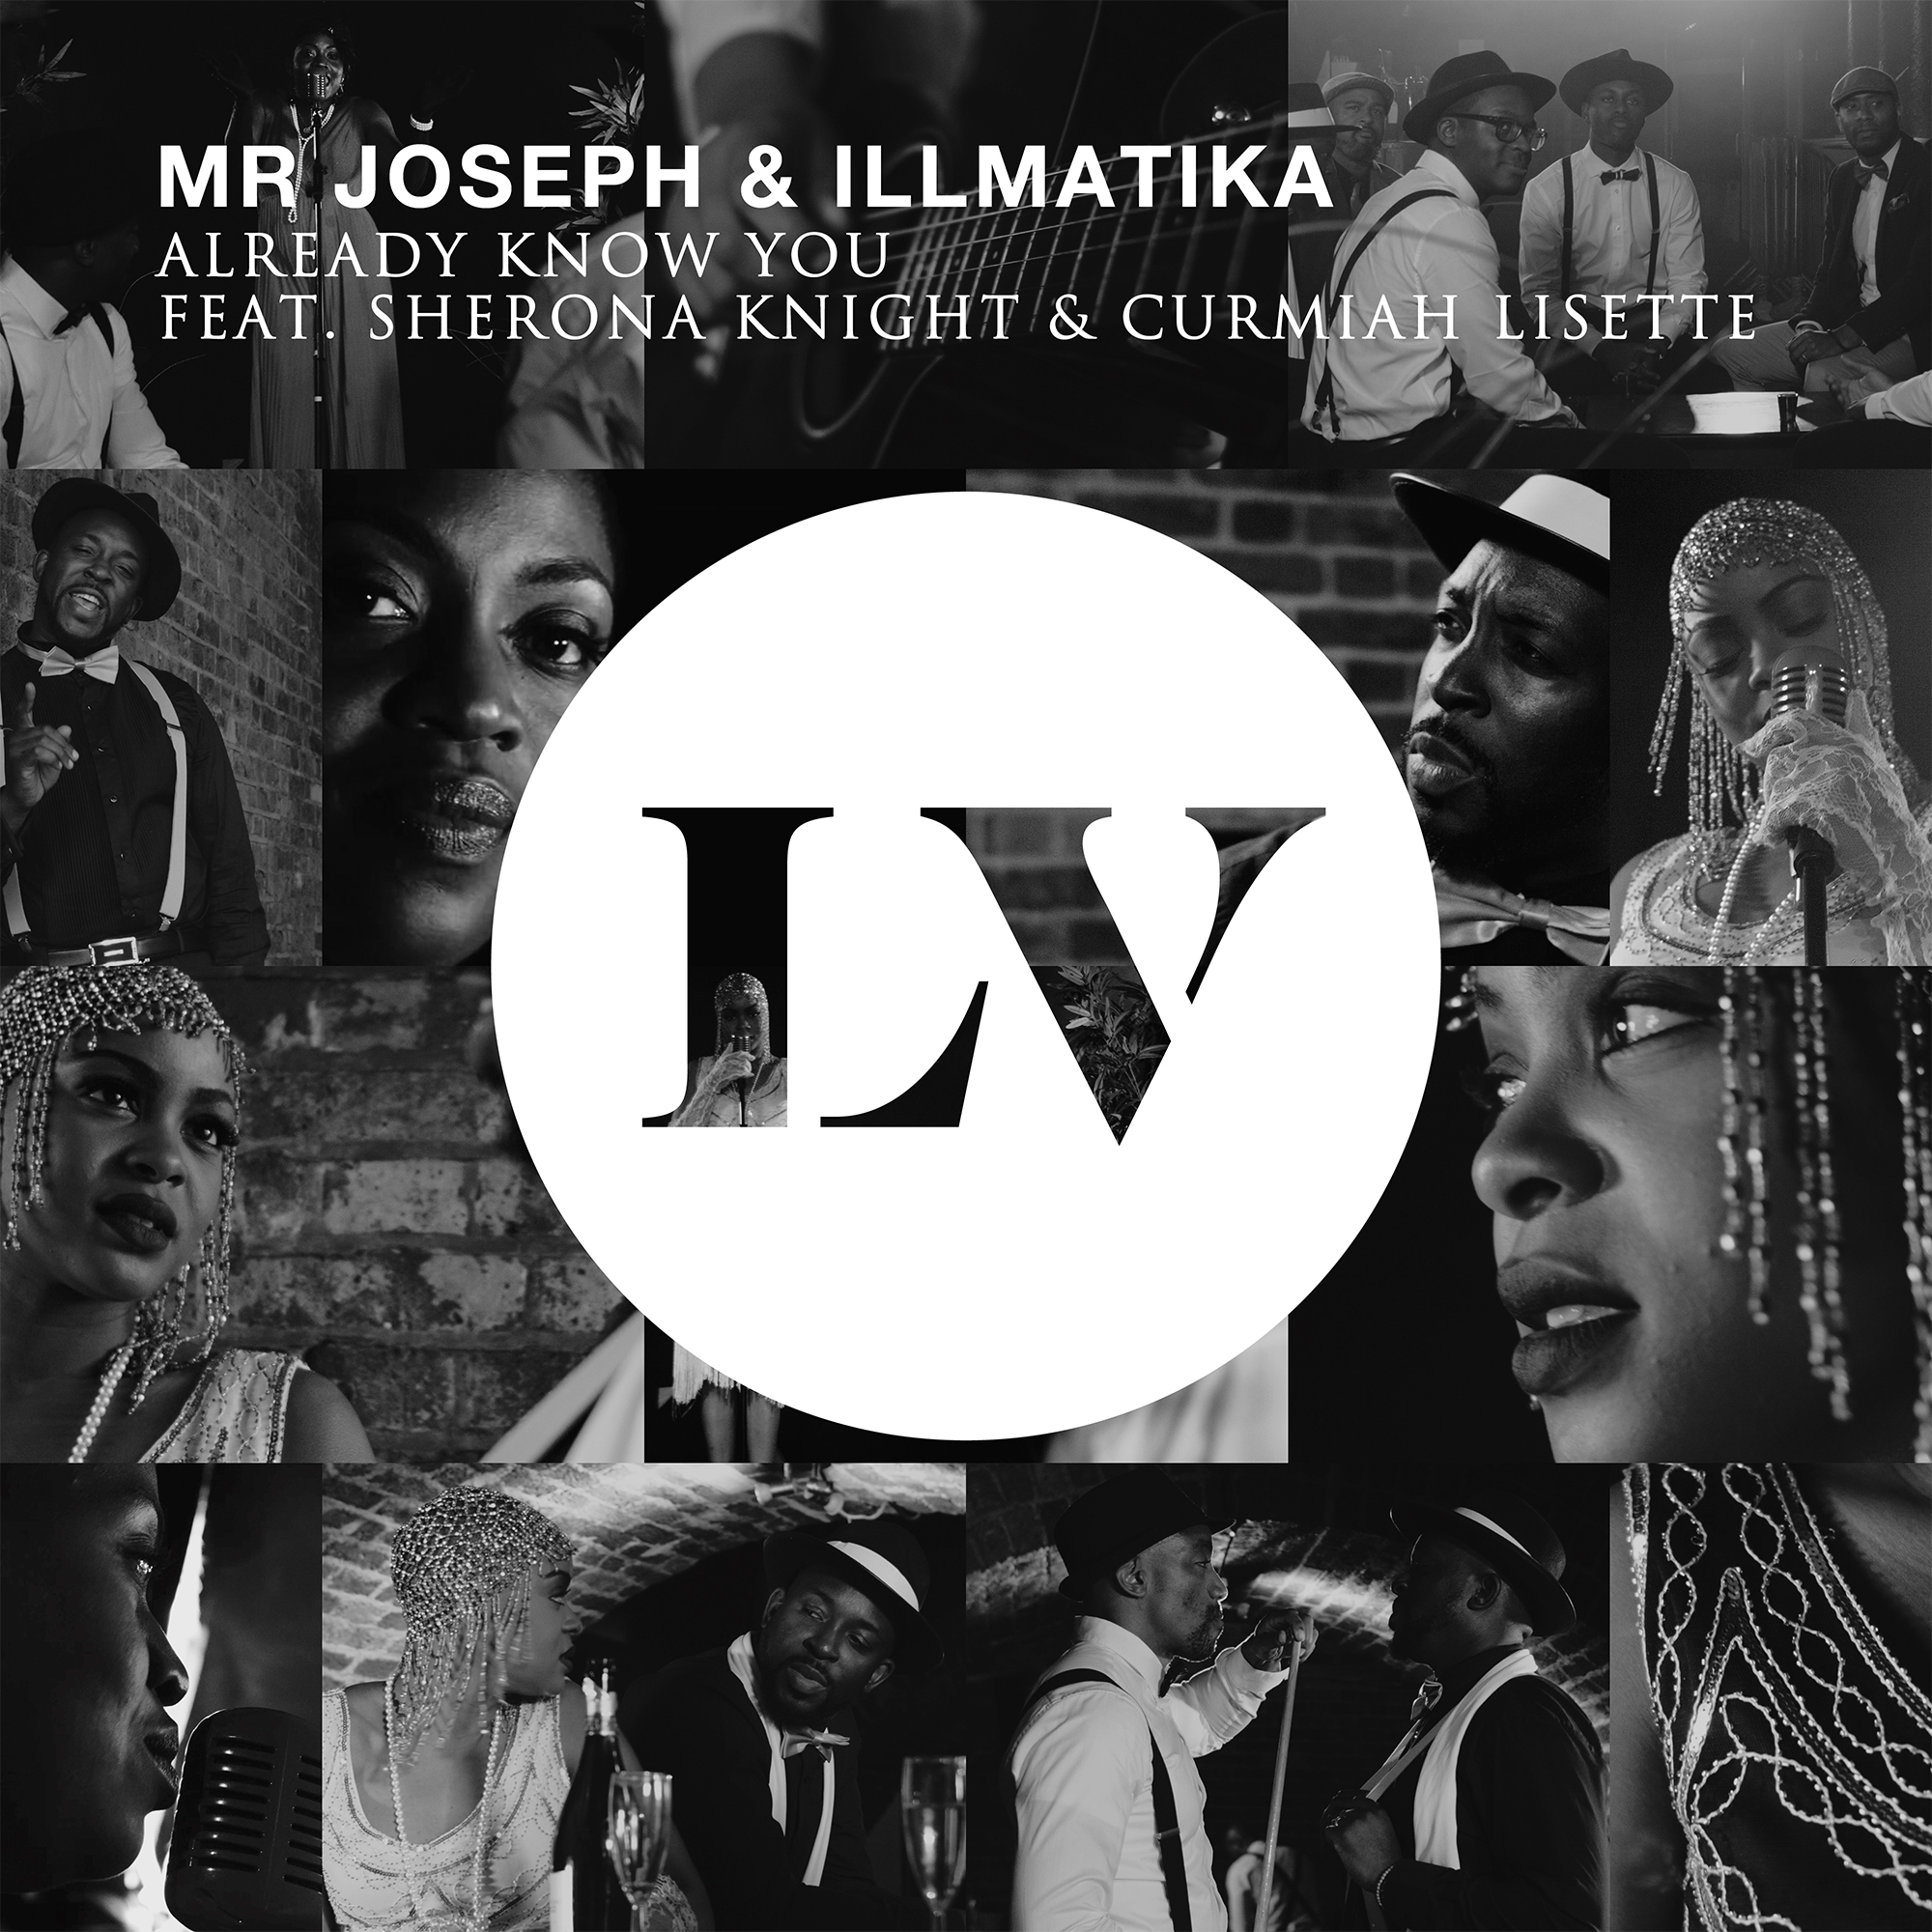 Already Know You feat. Sherona Knight & Curmiah Lisette